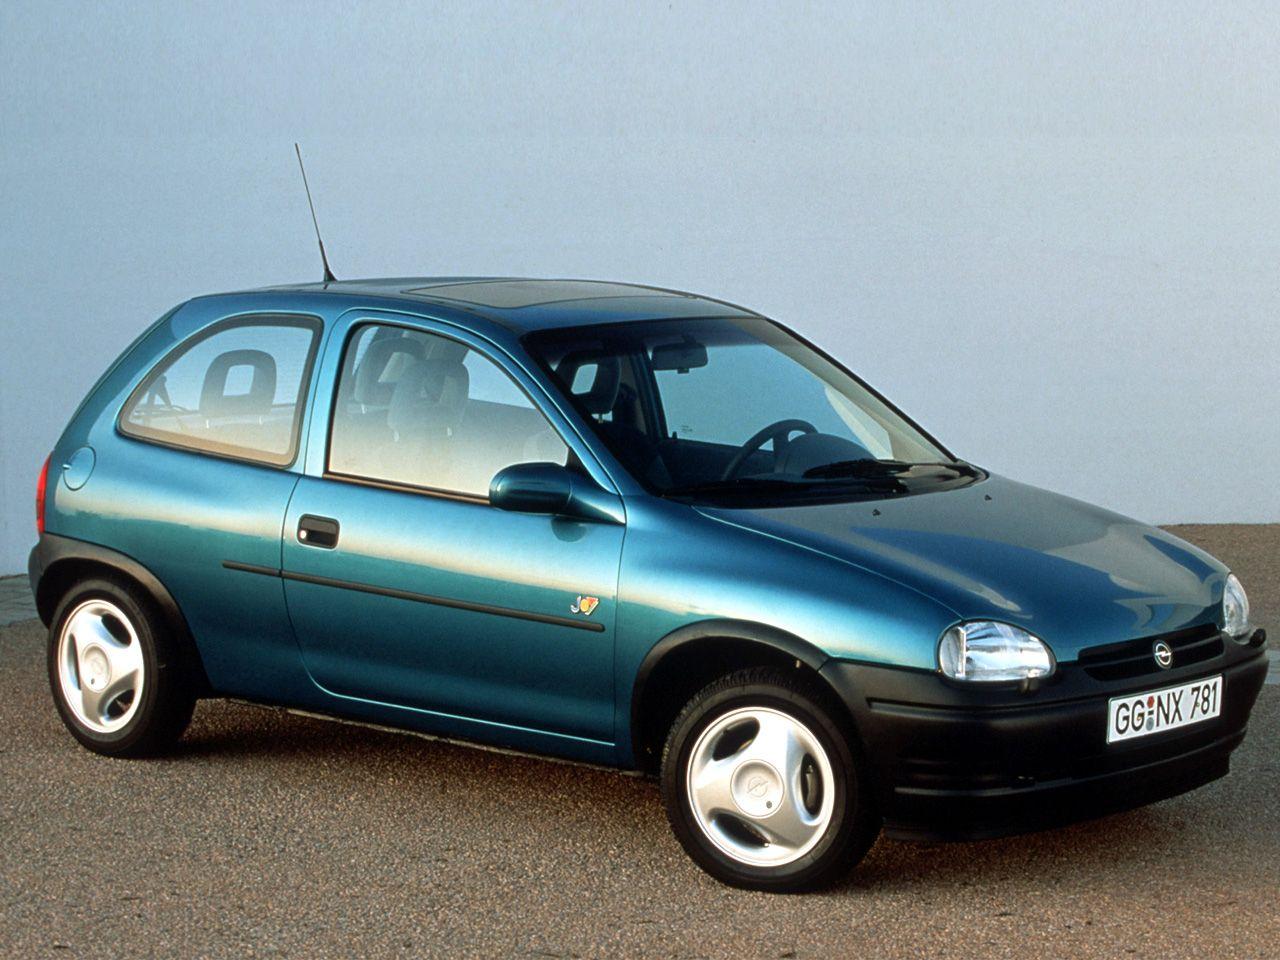 Opel corsa od 1982 roku wci na rynku for Garage opel nice